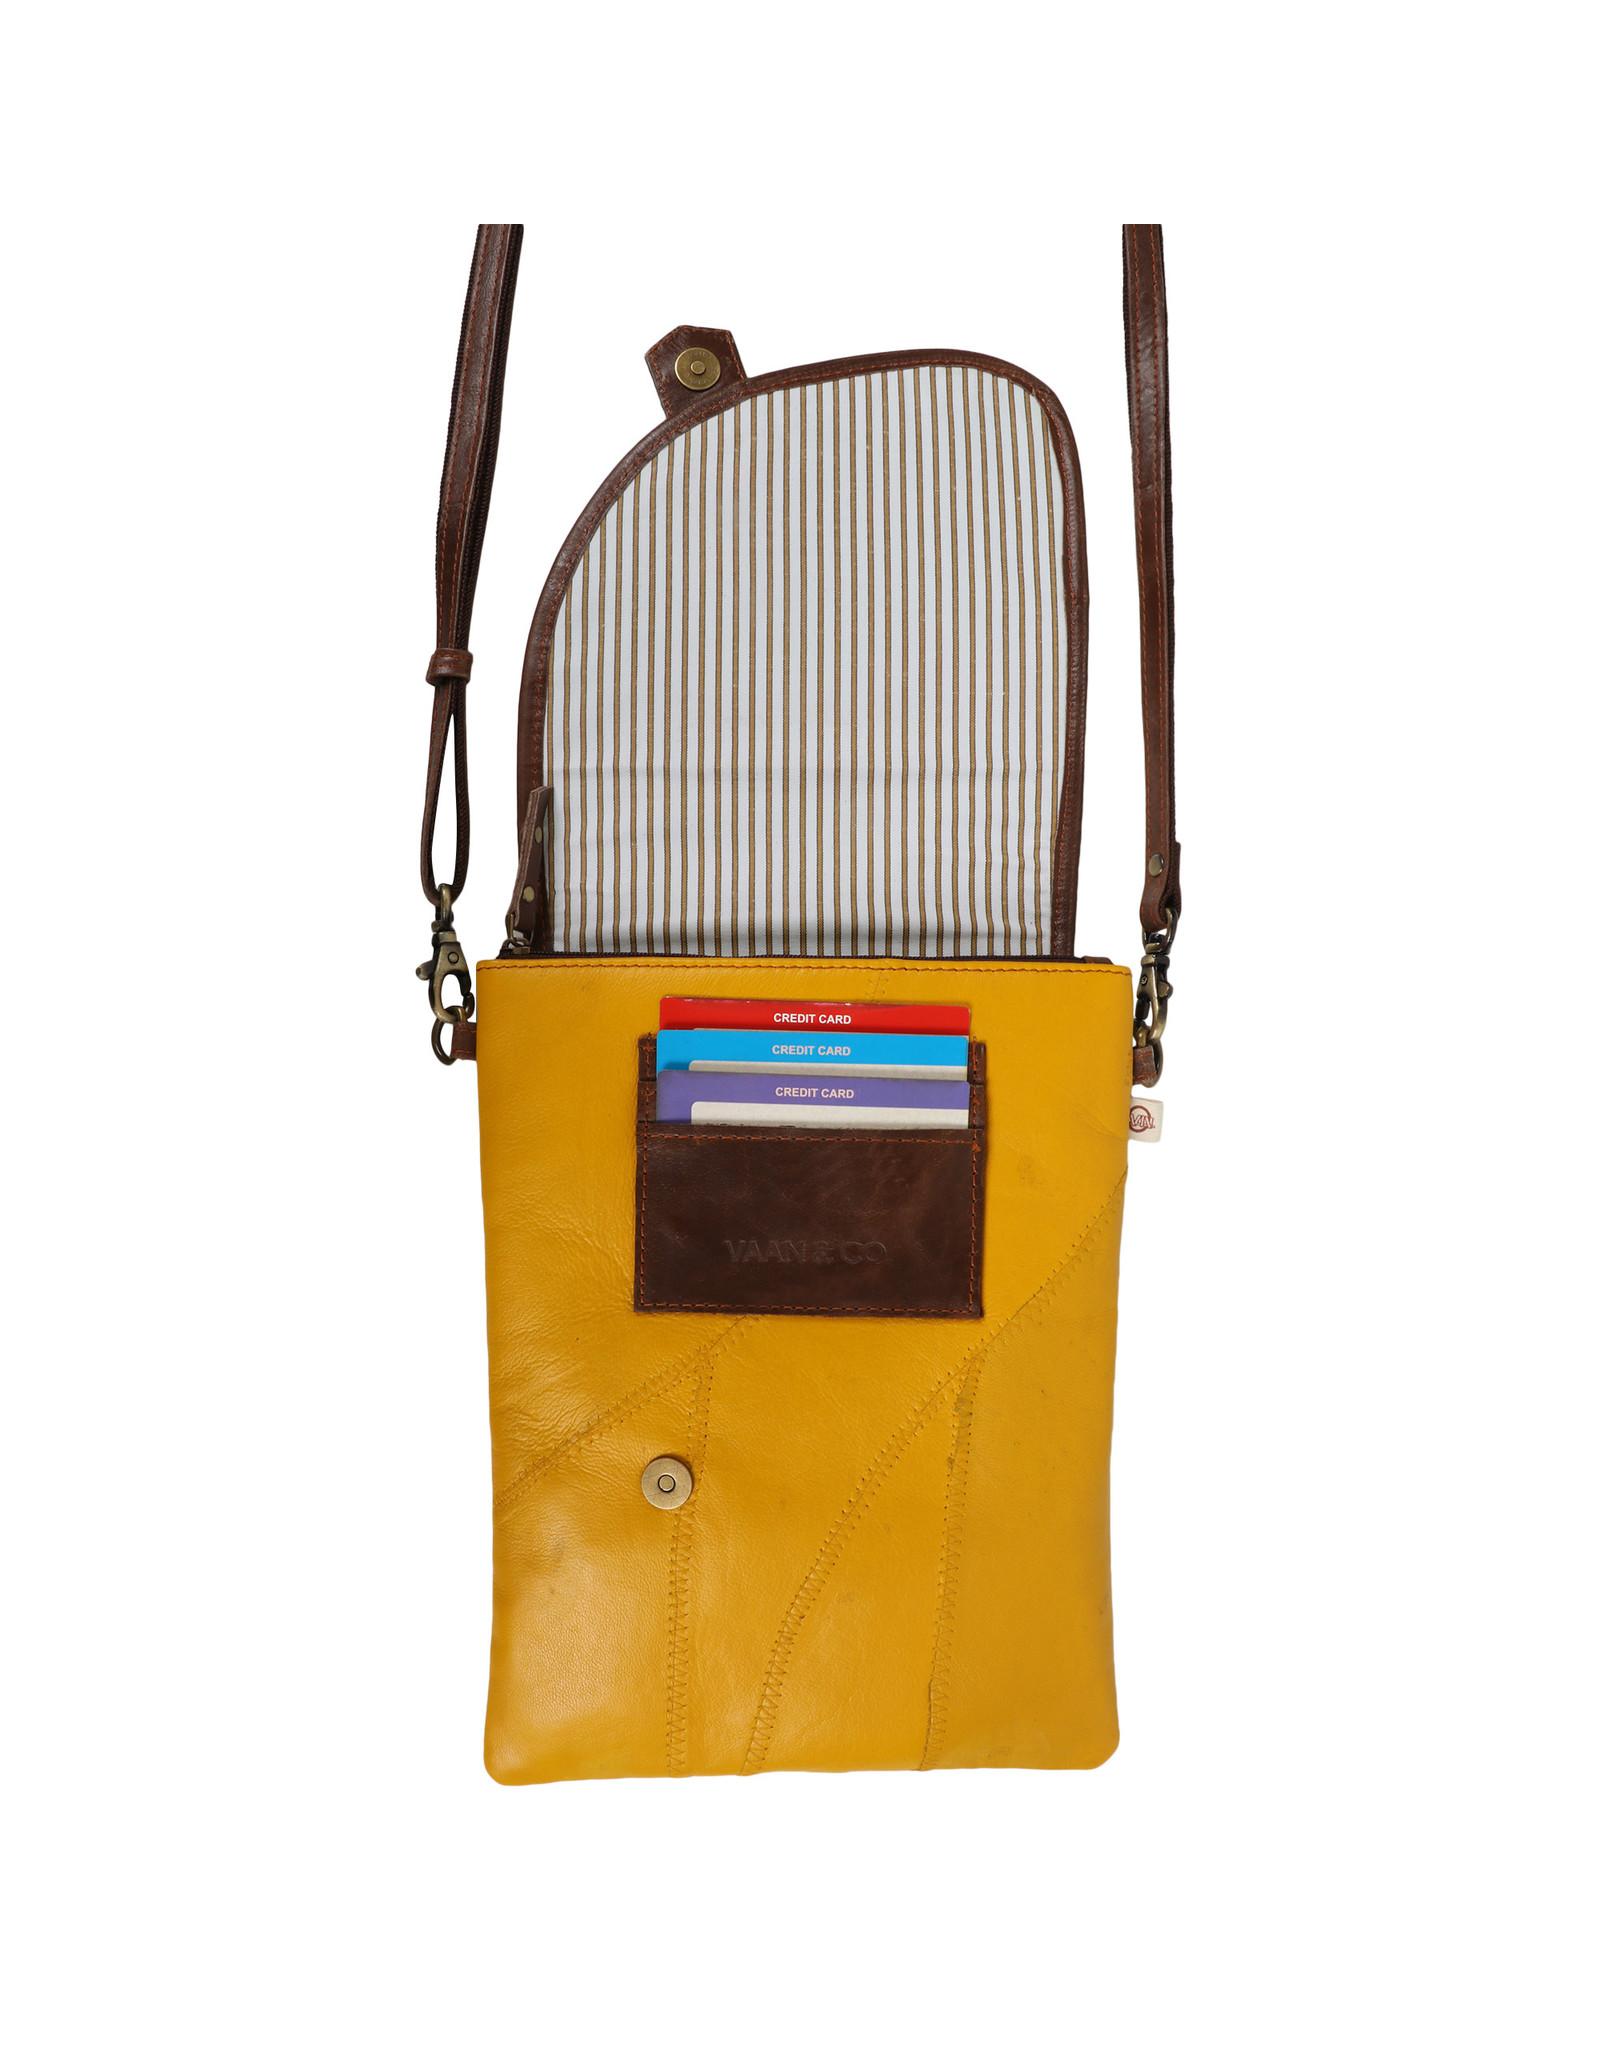 Vann & Co S2V-409 RFID Small Crossbody Bag with Flap